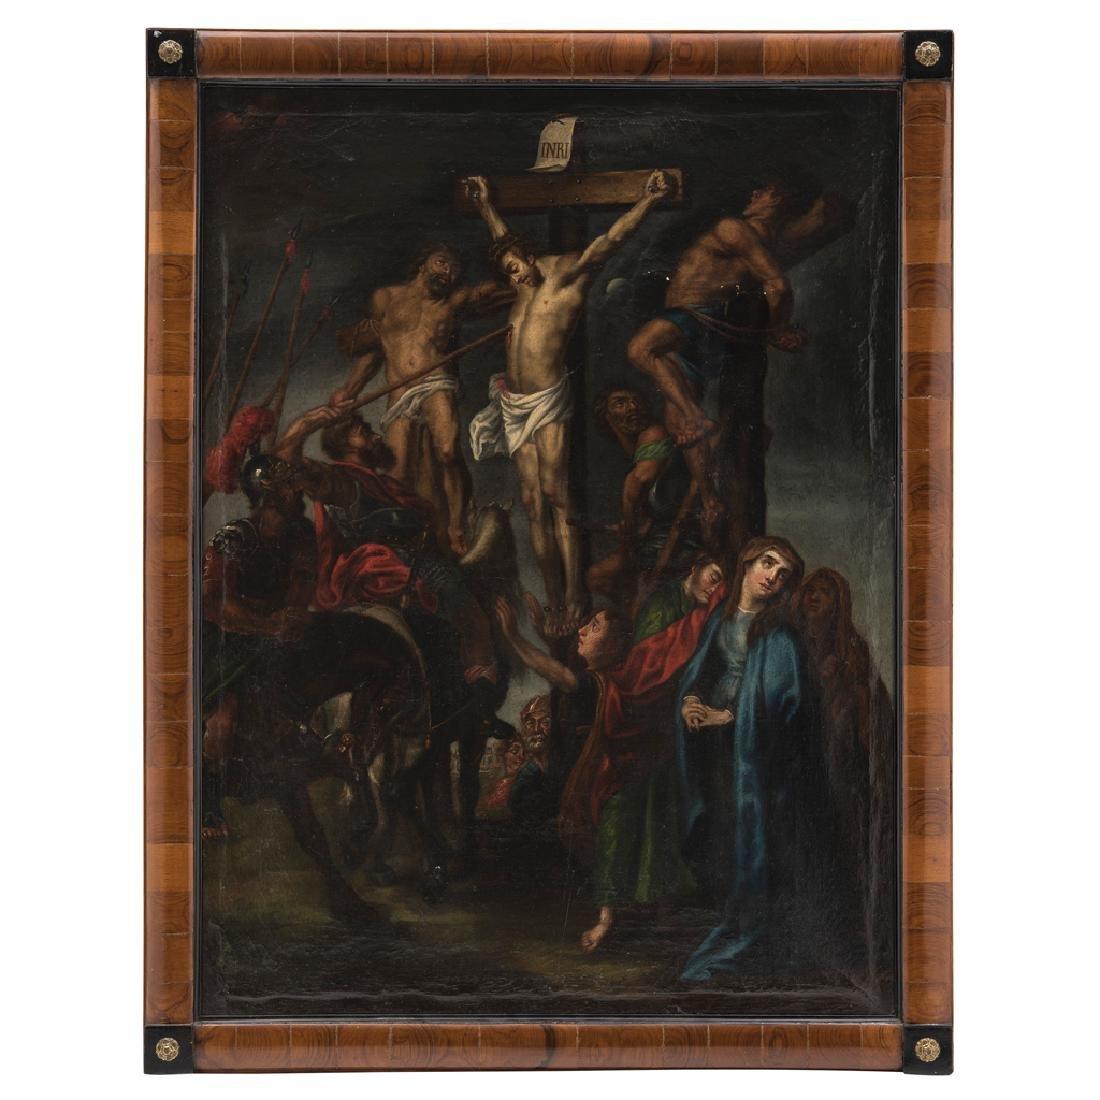 AFTER PETER PAUL RUBENS (FLEMISH, 1577-1640). CHRIST ON